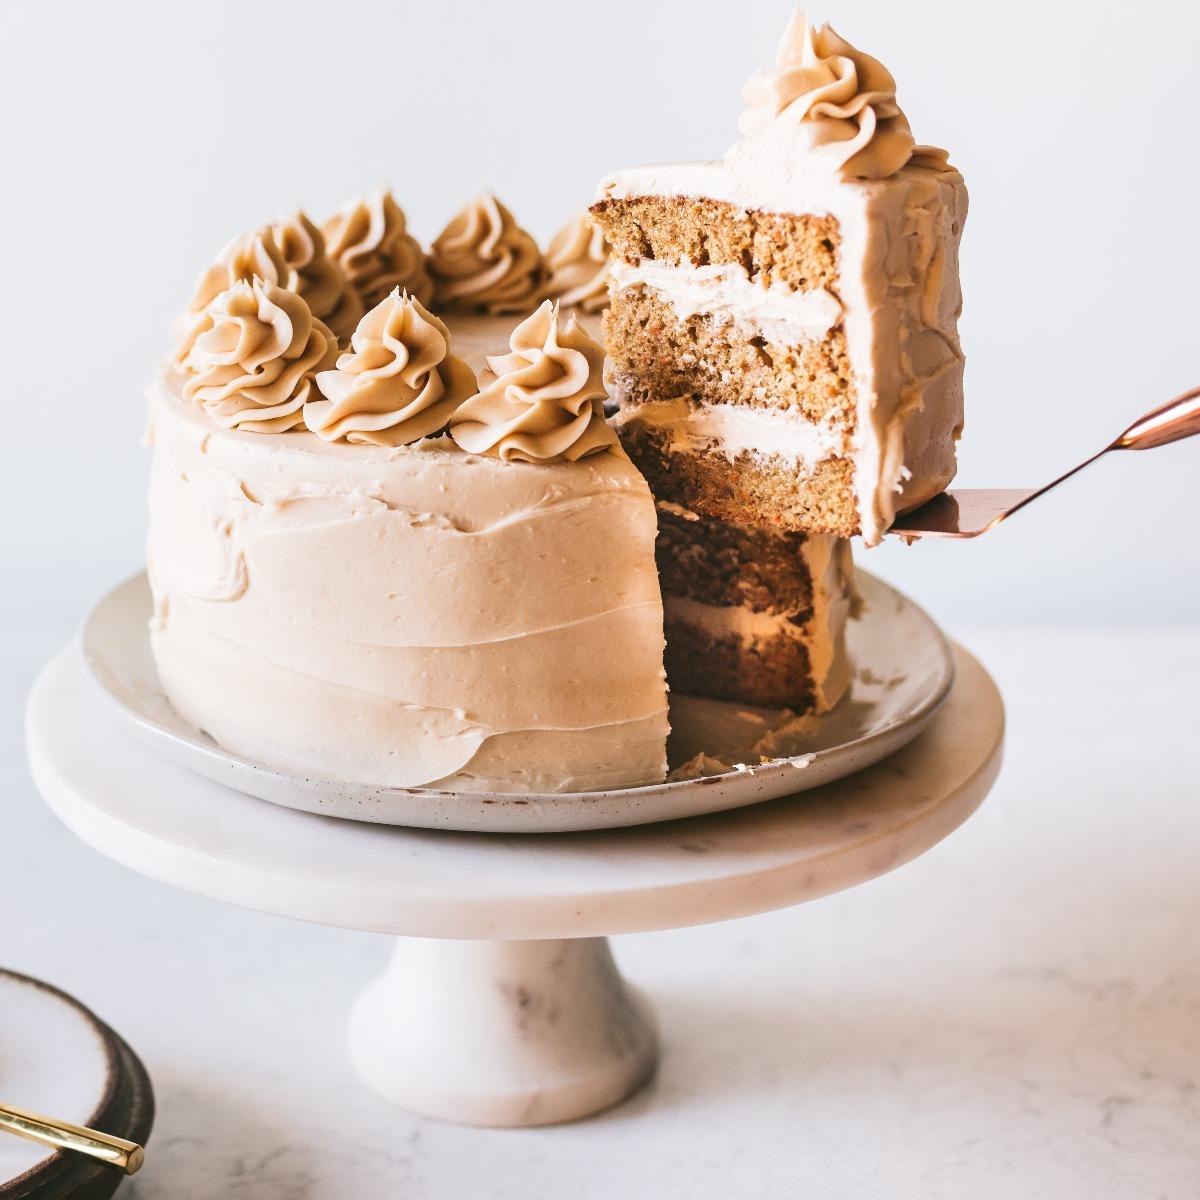 ALMOND INSPIRATION CARROT CAKE